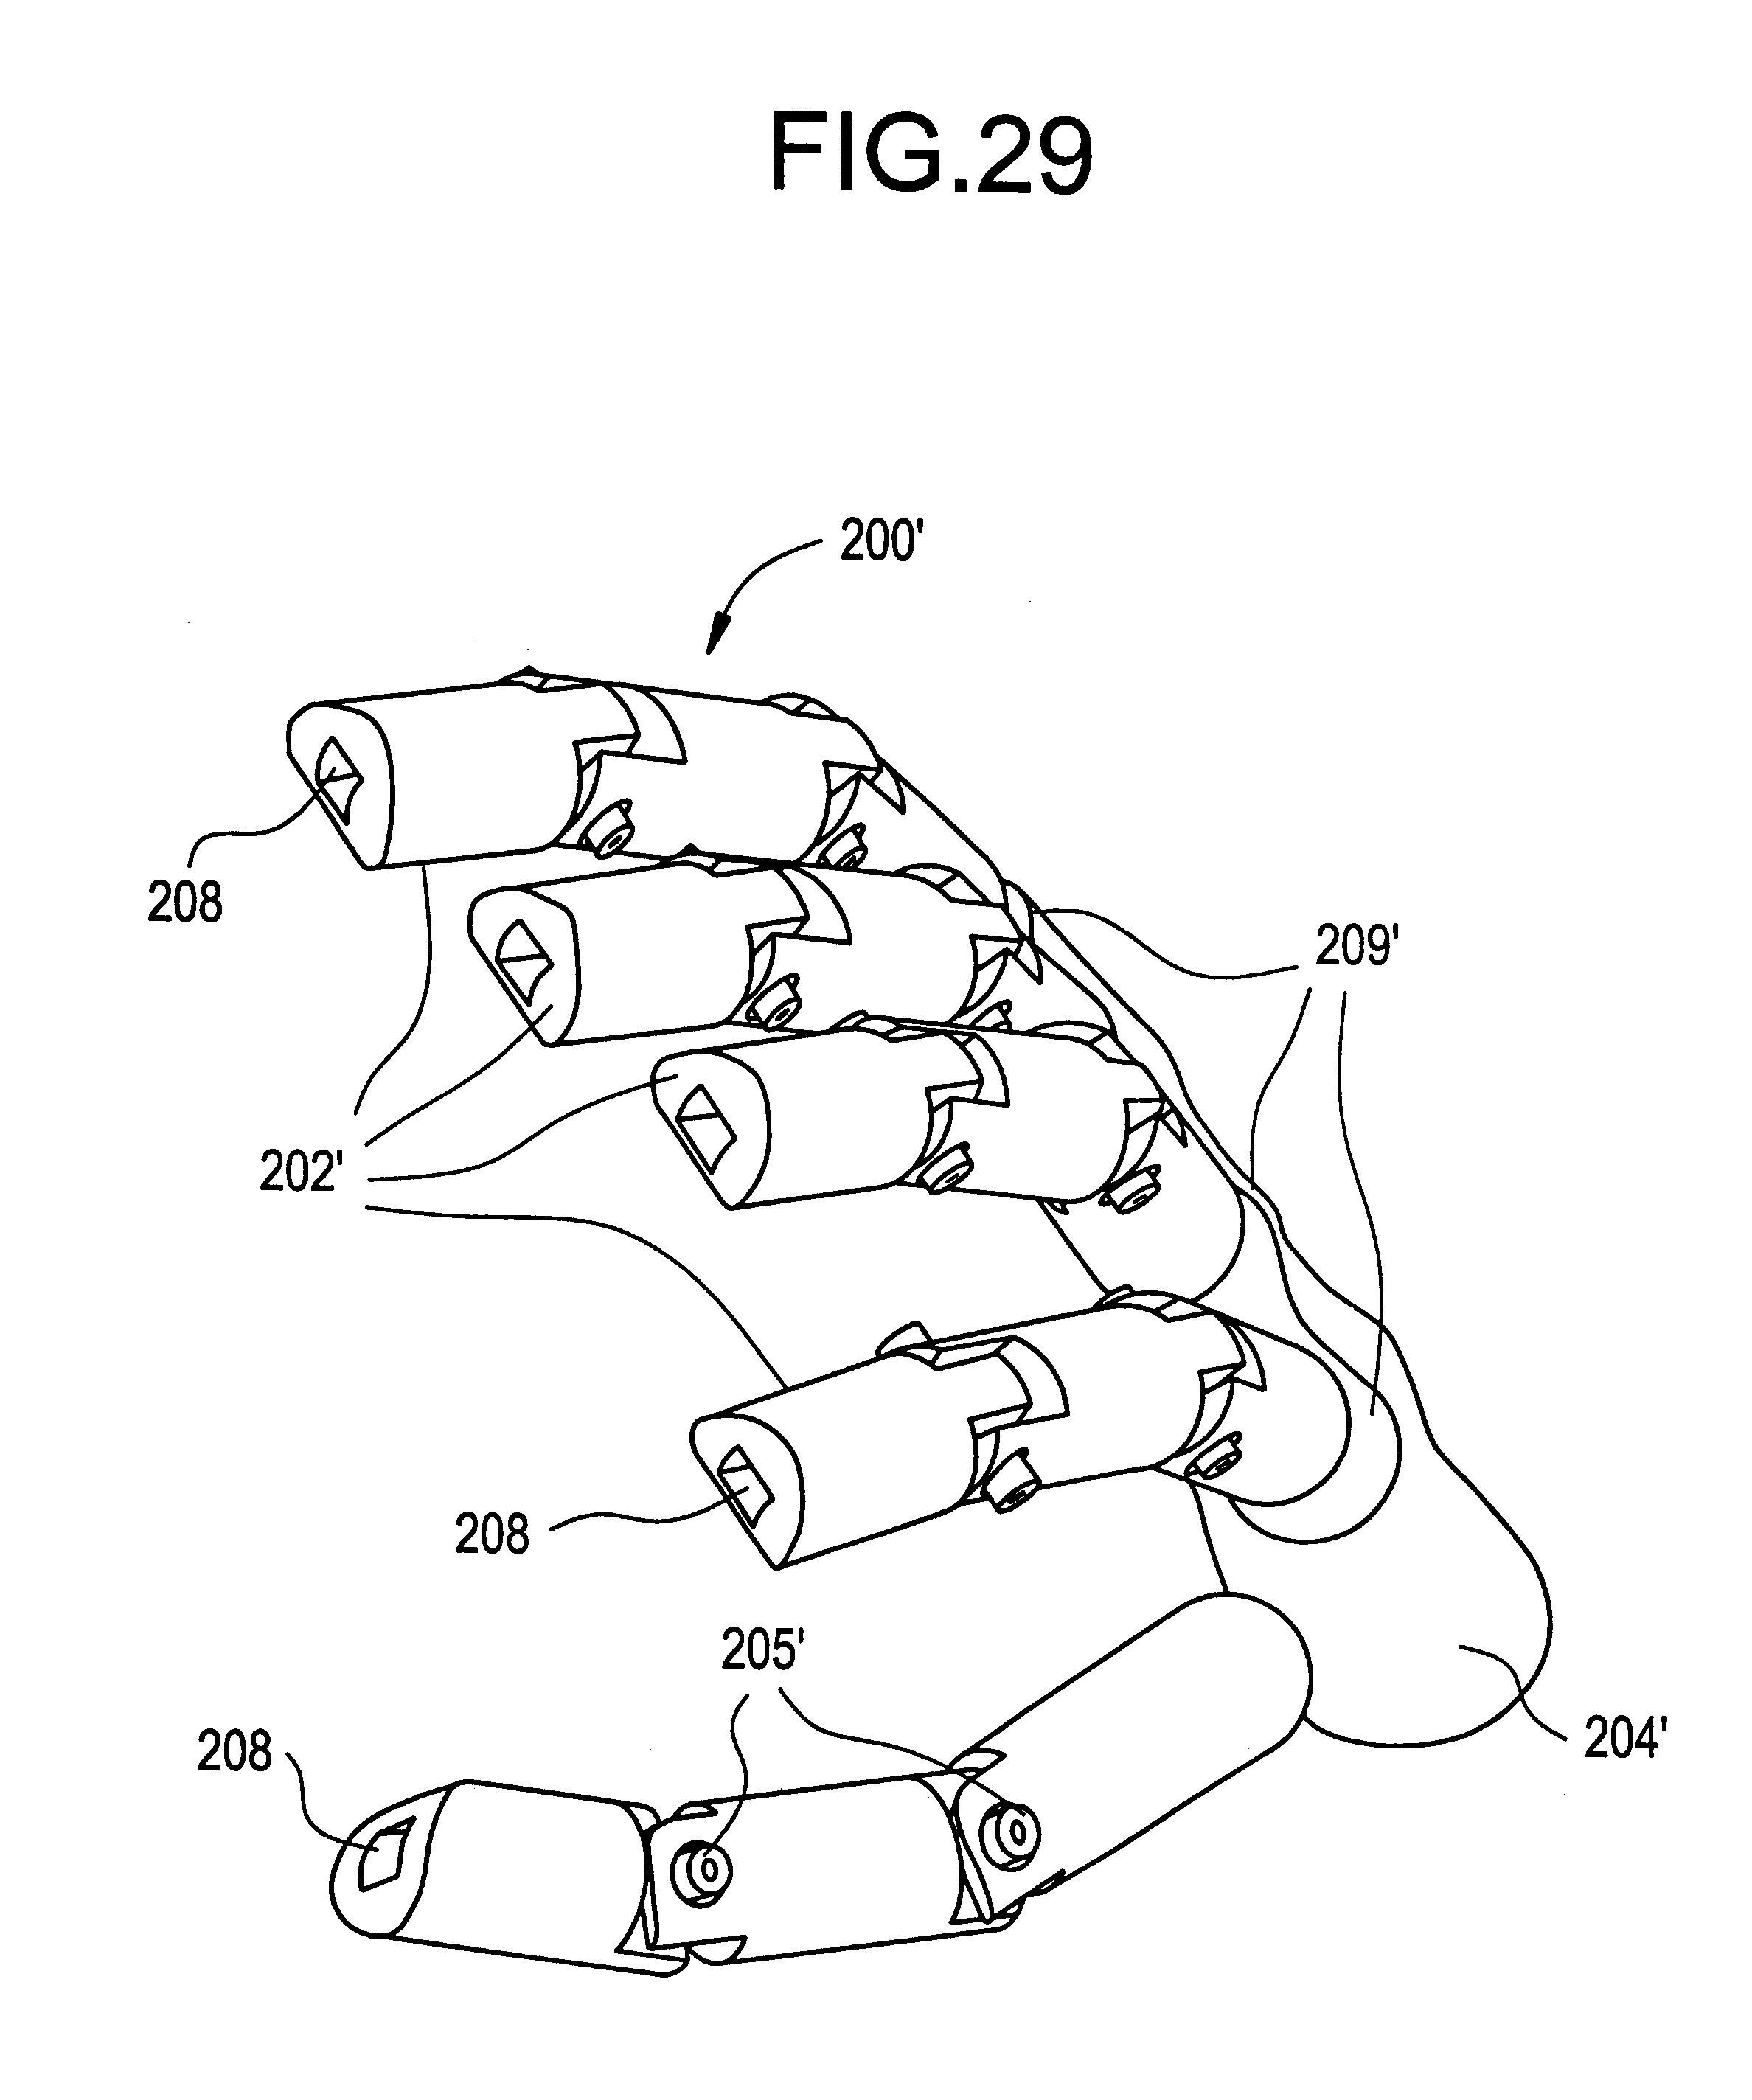 Patent US6379393 Prosthetic orthotic and other rehabilitative